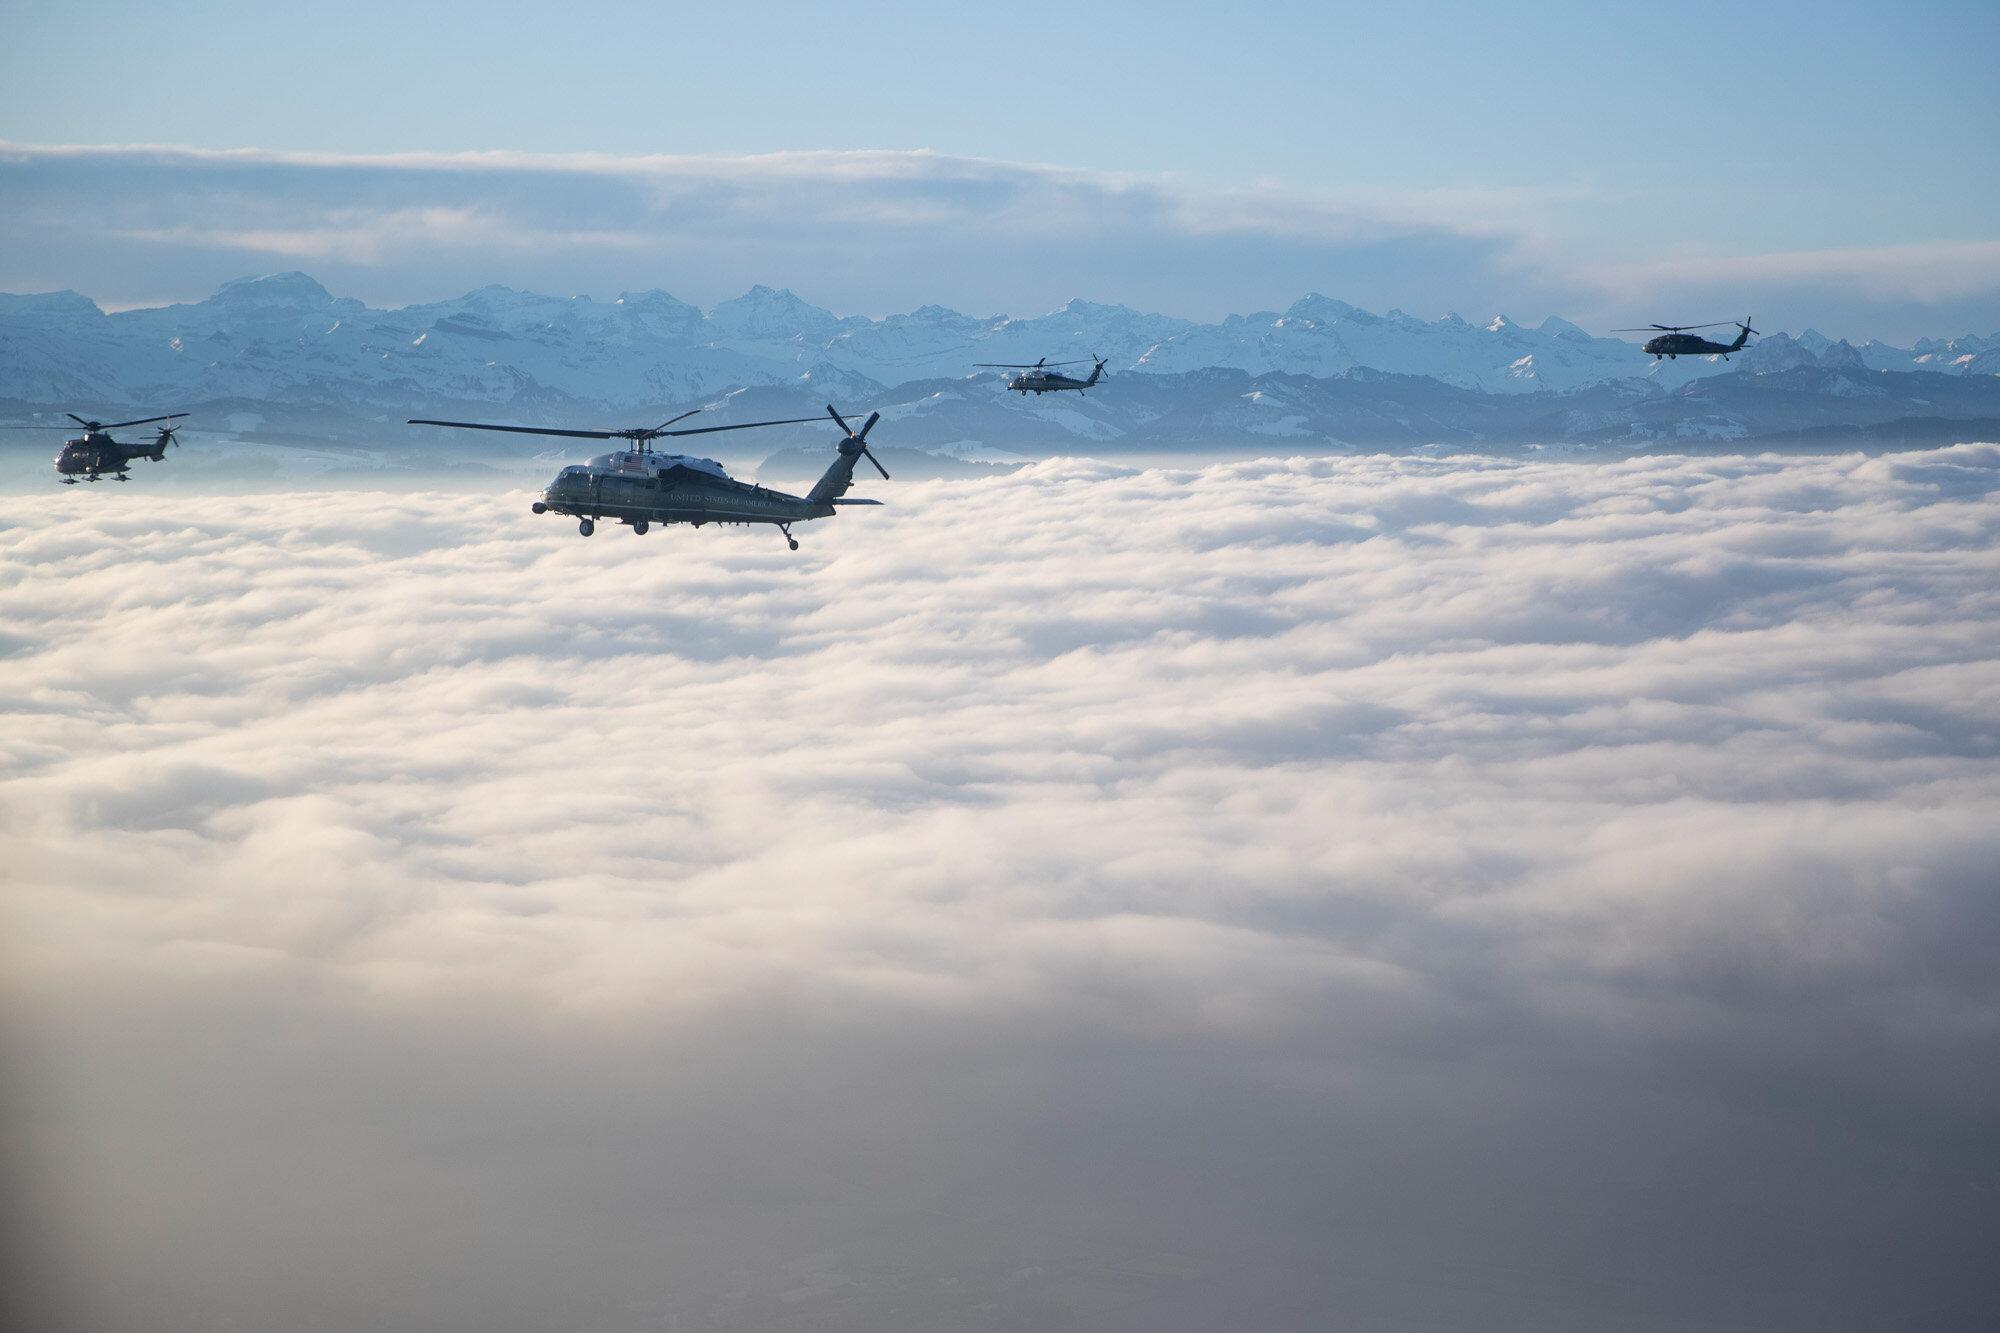 Marine One carrying U.S. President Donald Trump flies to Davos, Switzerland, for the World Economic Forum on Jan. 21, 2020. (AP Photo/Evan Vucci)